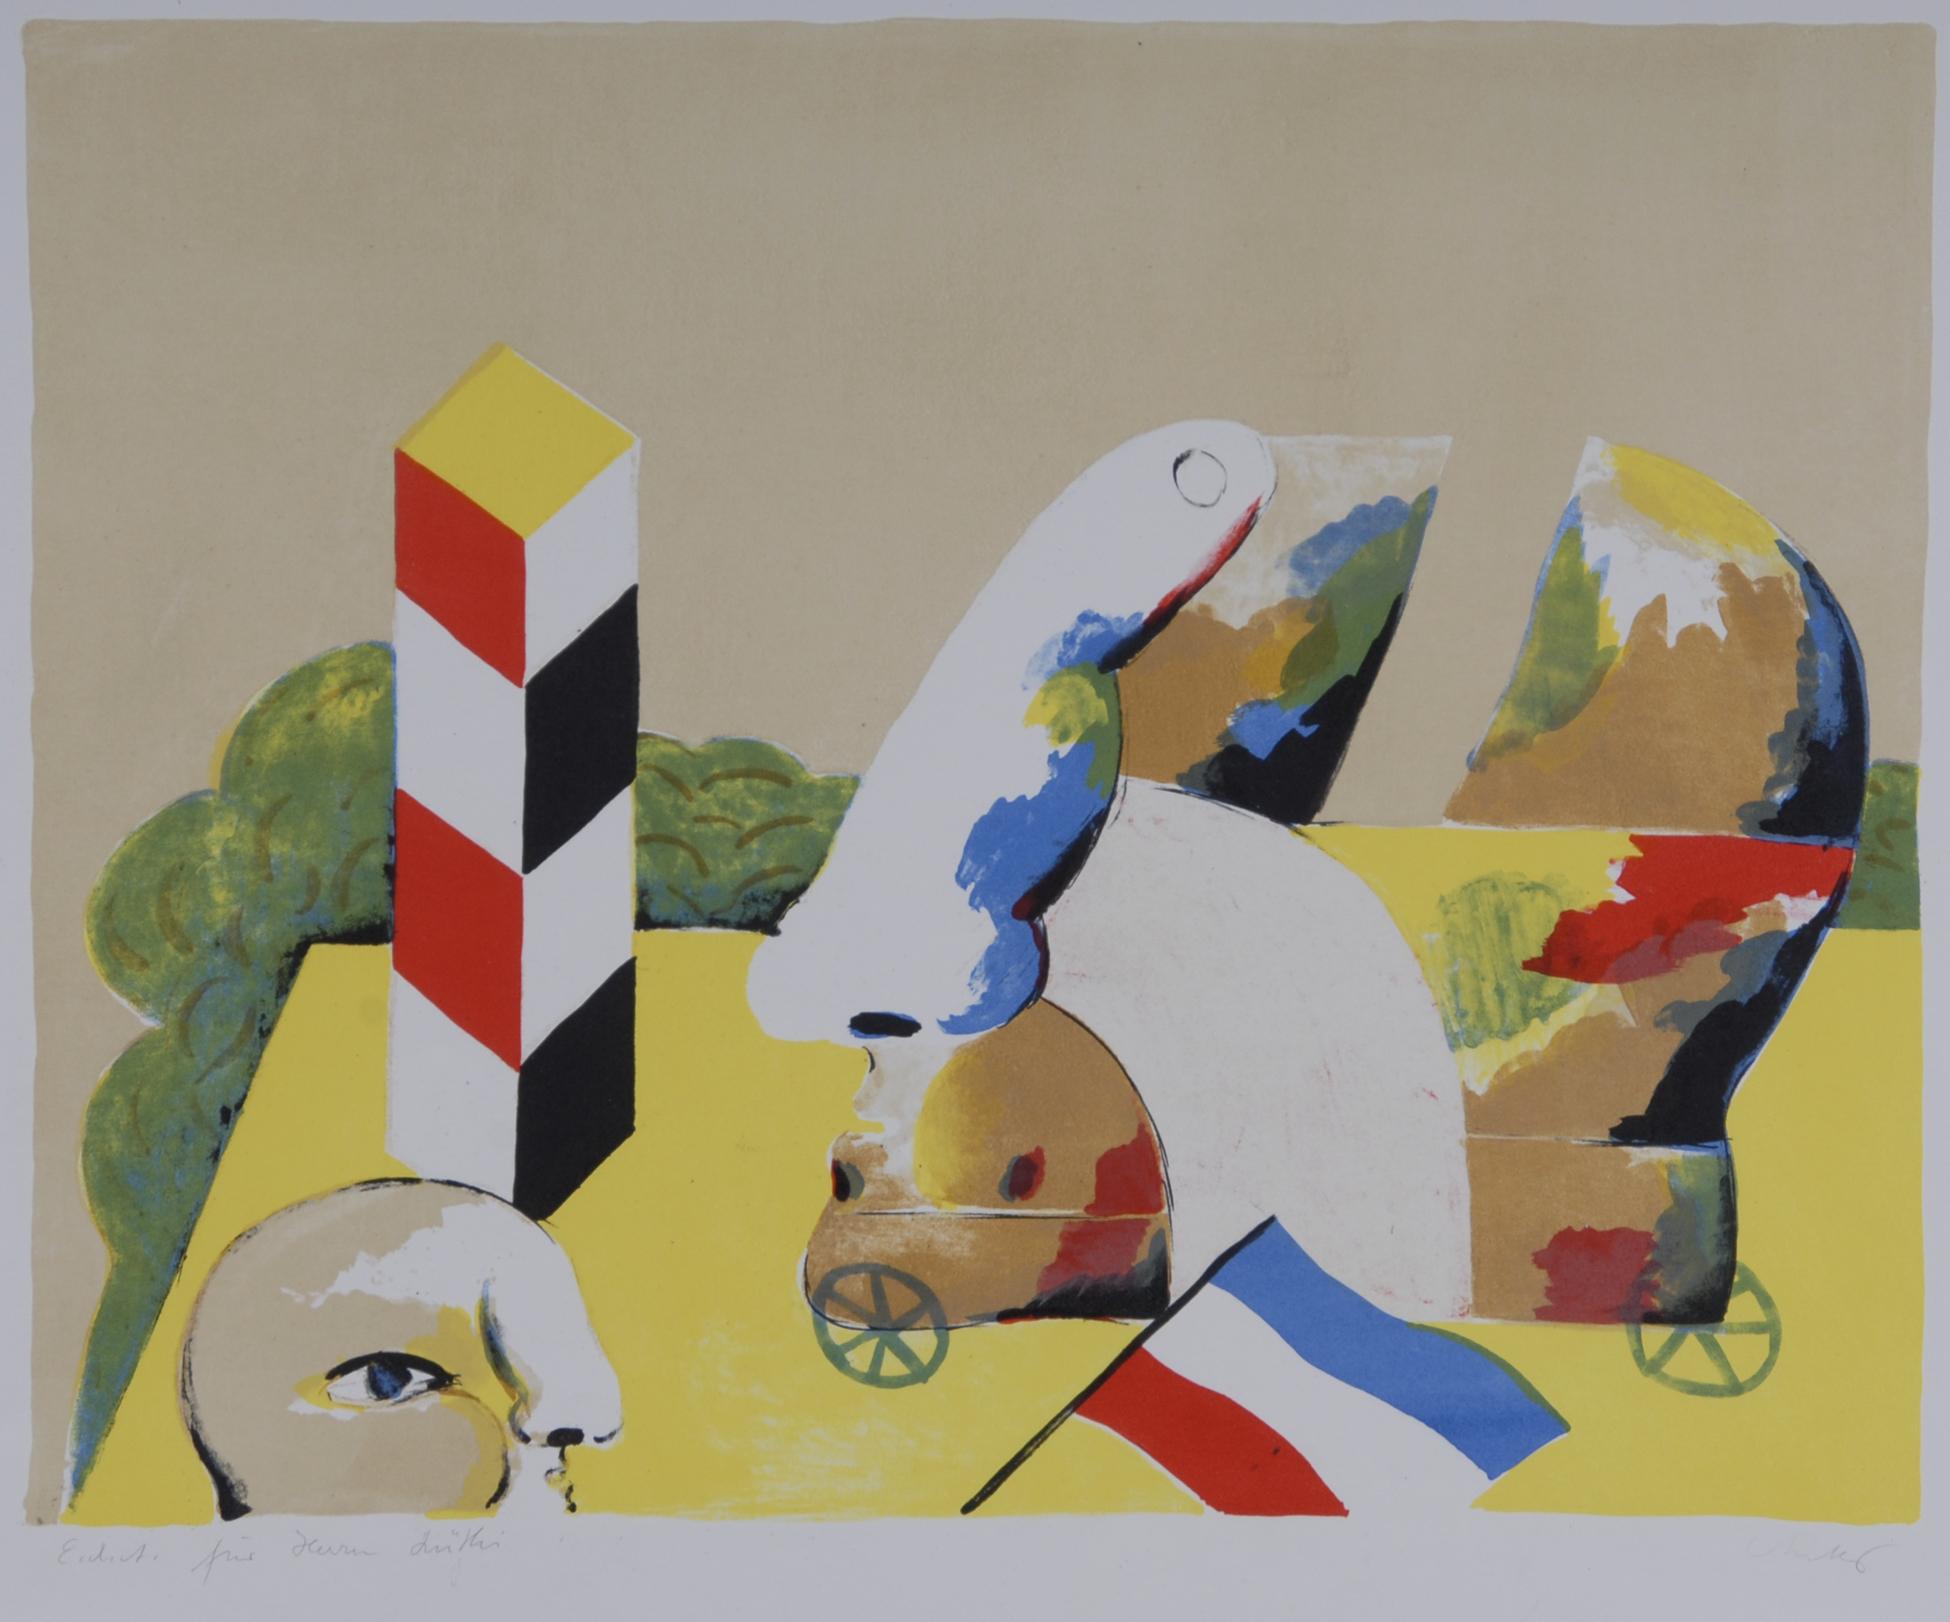 Antes Horst, 2 sheets: Kopf auf Rädern, 1967; Zürcher-Kopf